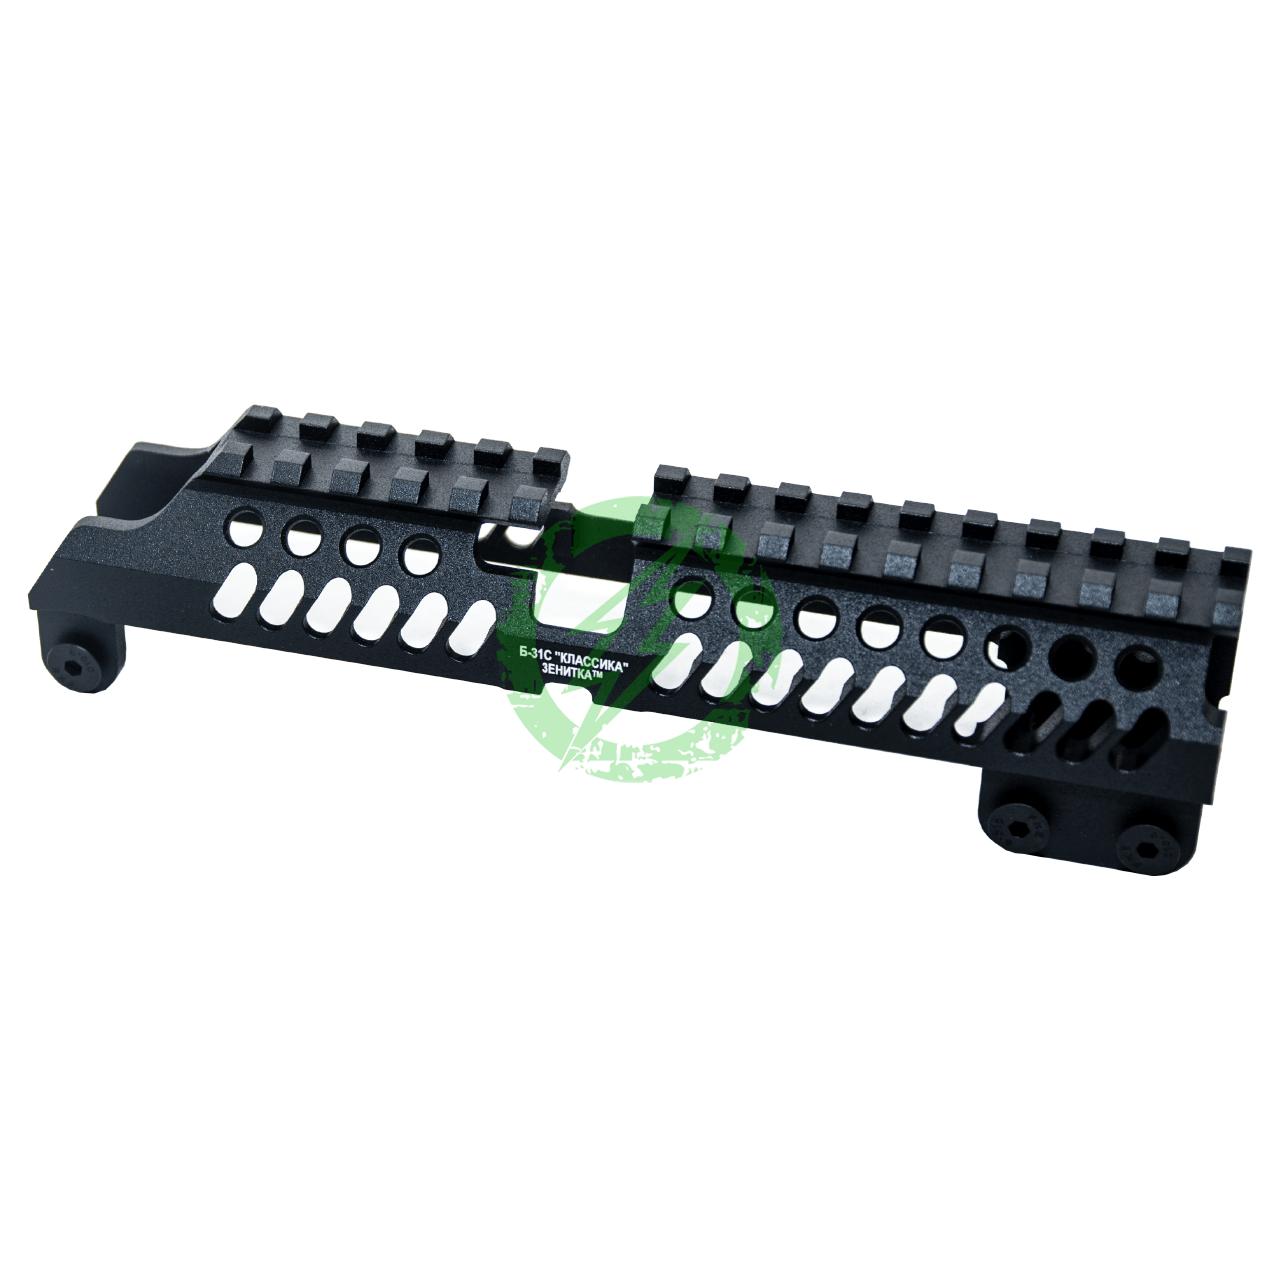 LCT Z-Series B-31 Classic Upper Rail Handguard | Black